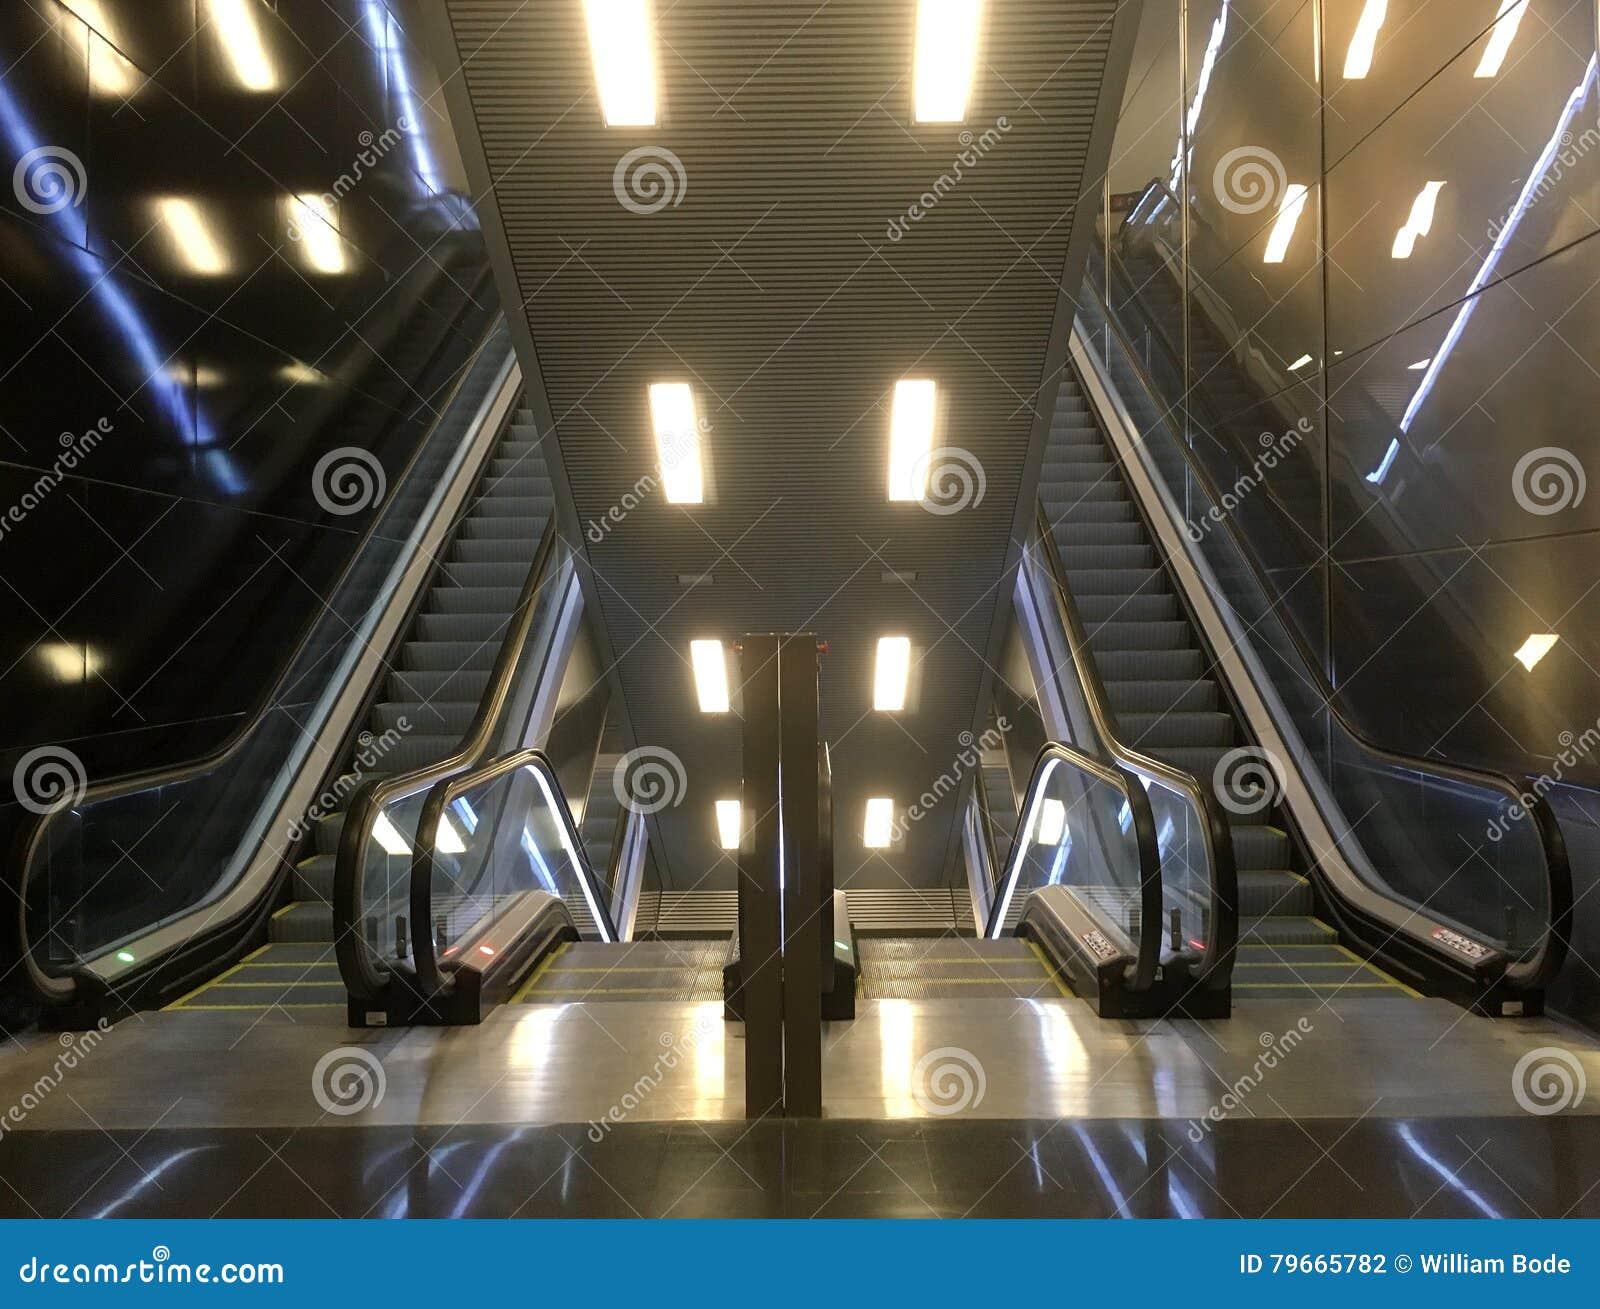 Double Escalator Ascend And Descend Stock Photo - Image of